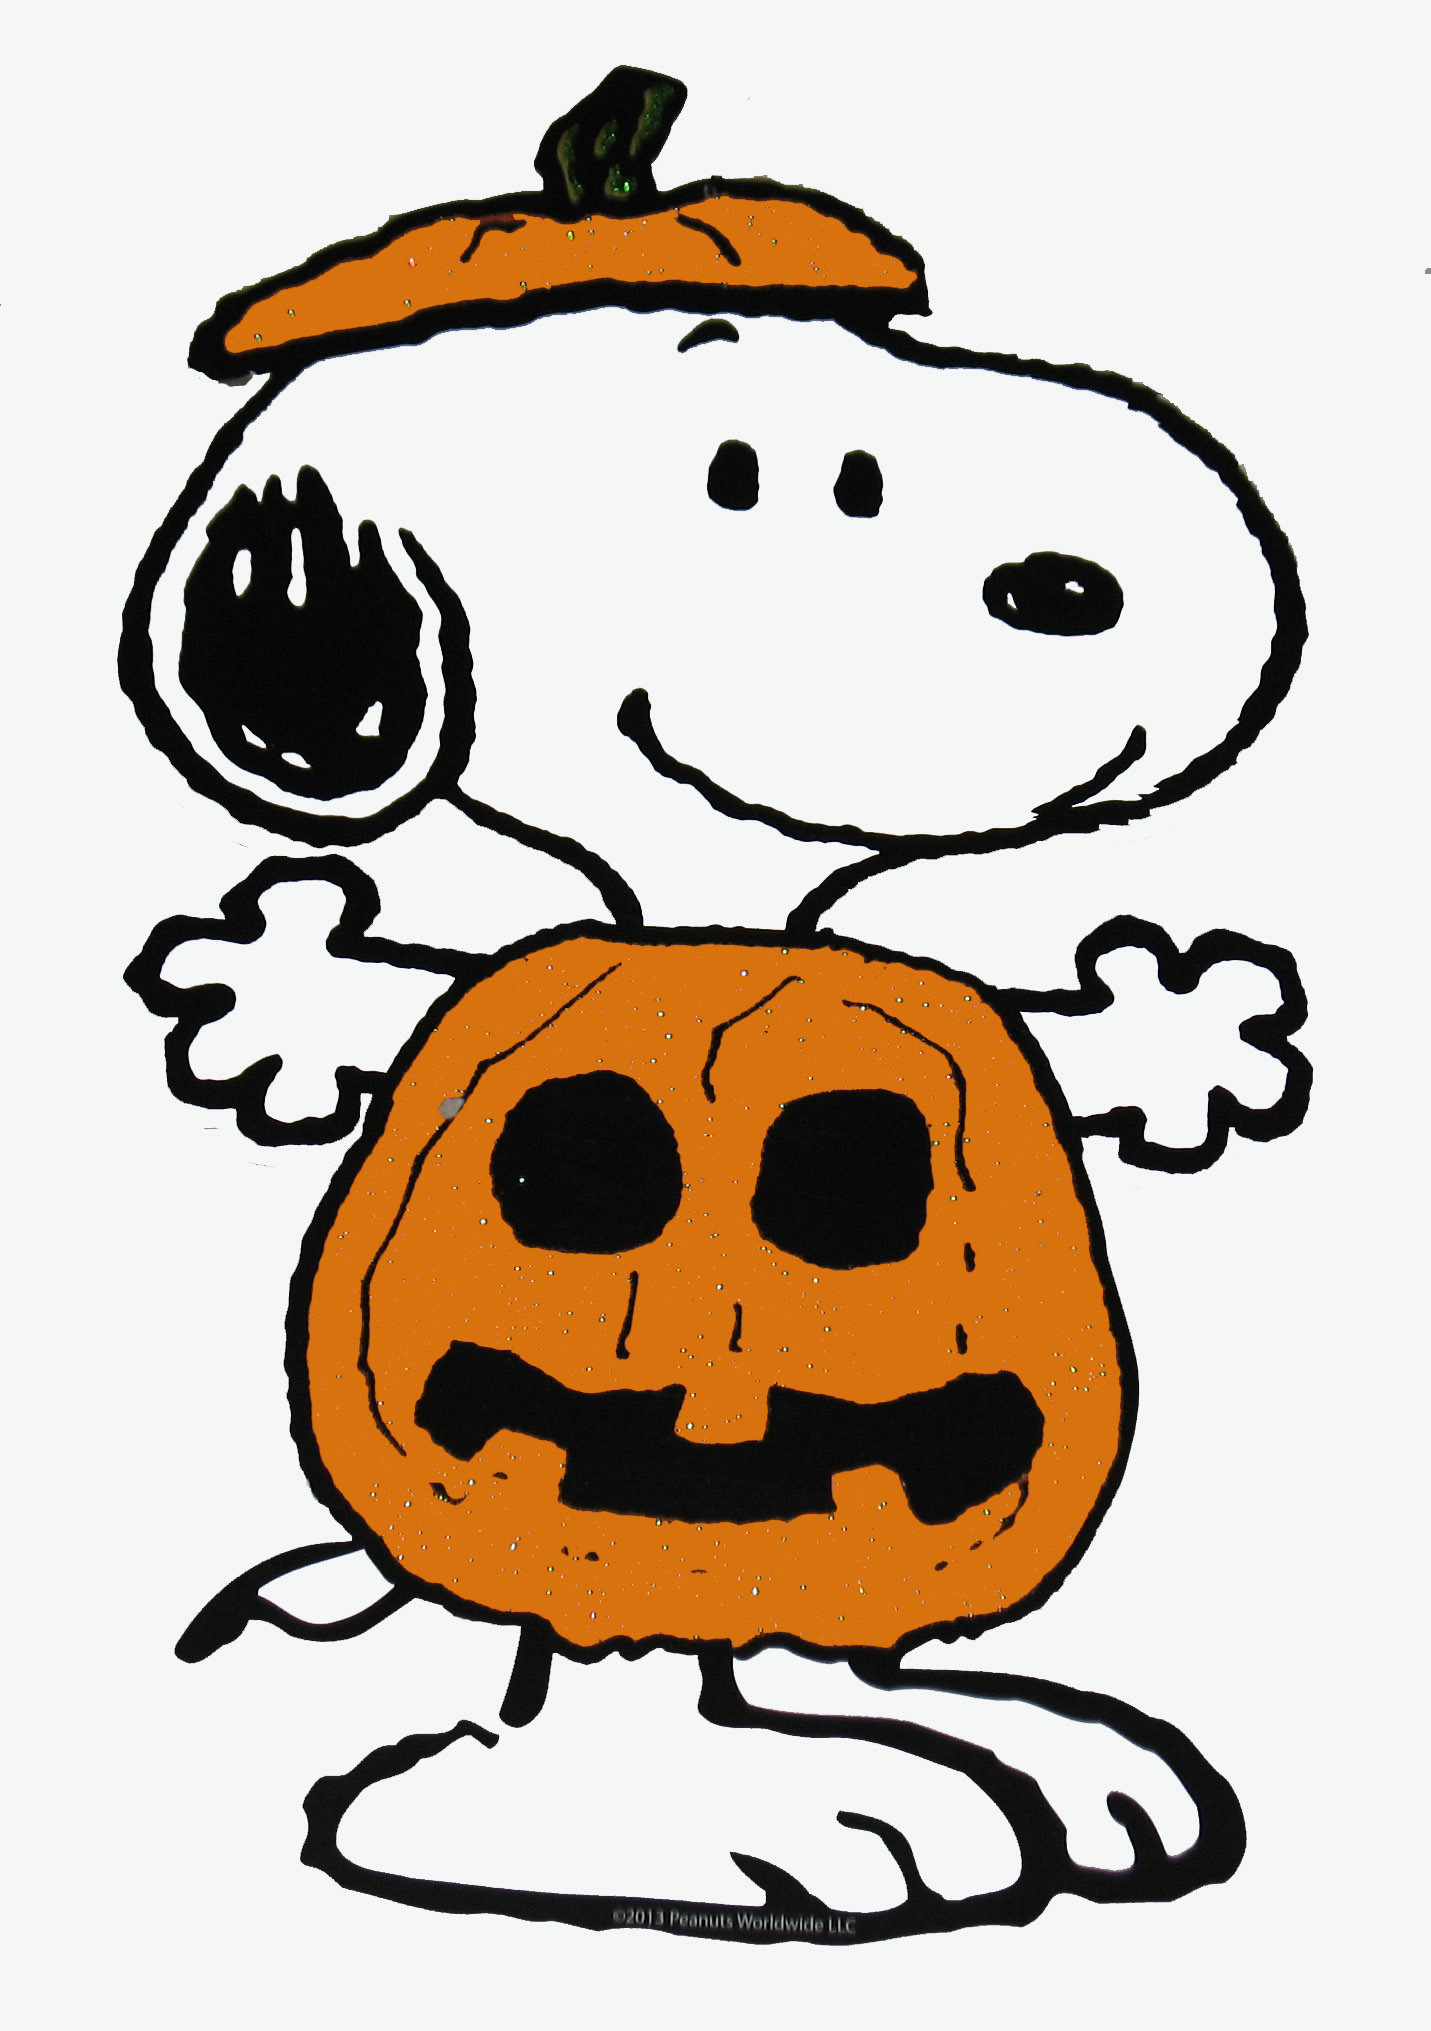 Peanuts Gang Sparkling Halloween Die-Cut Wall Decor – Snoopy .